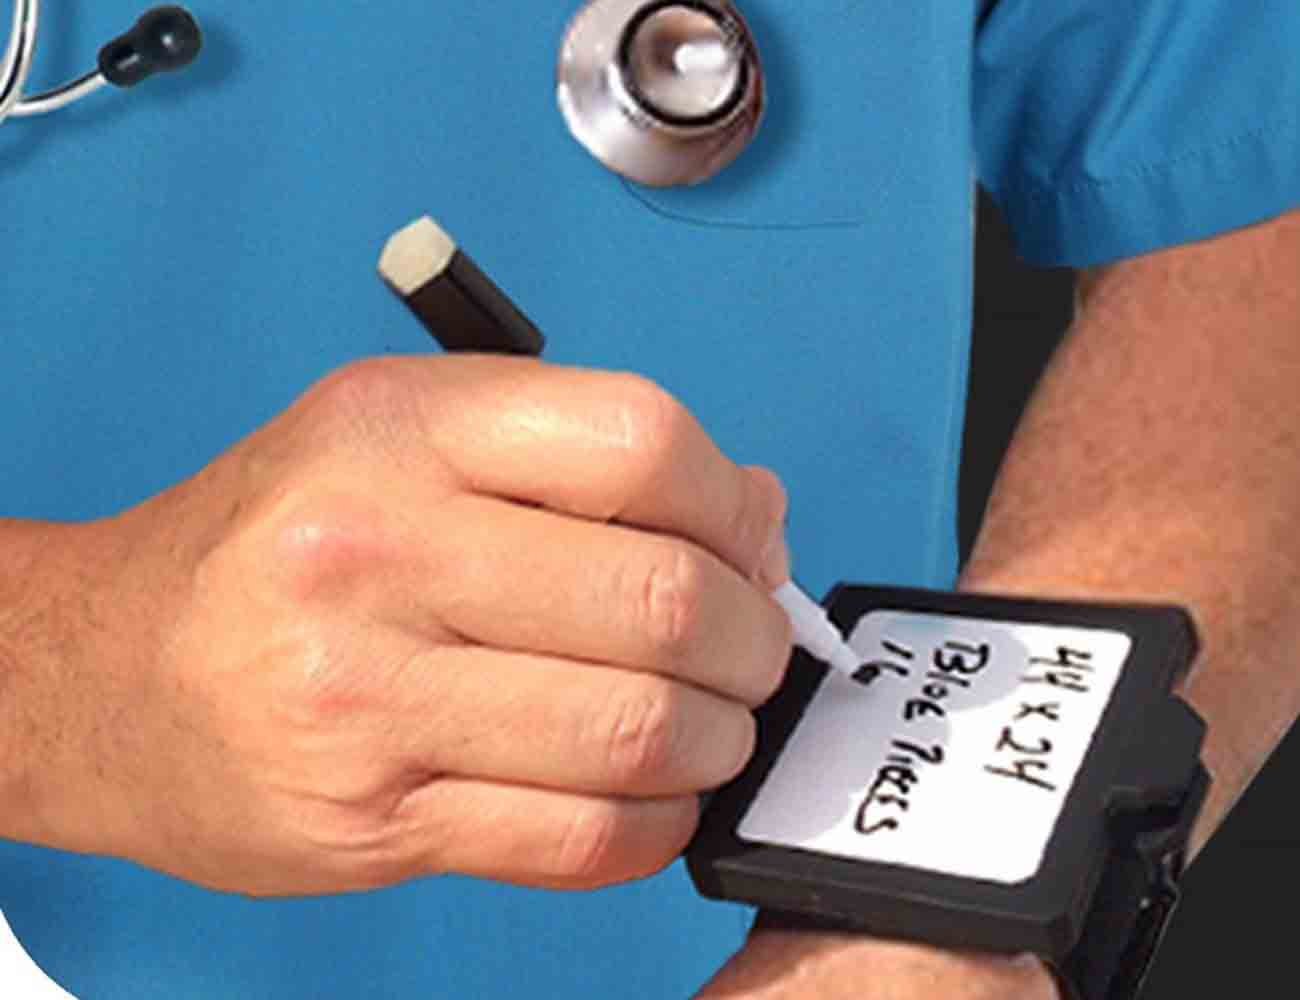 Wear-N-Write – Dry Erase Board That You Wear On Your Wrist